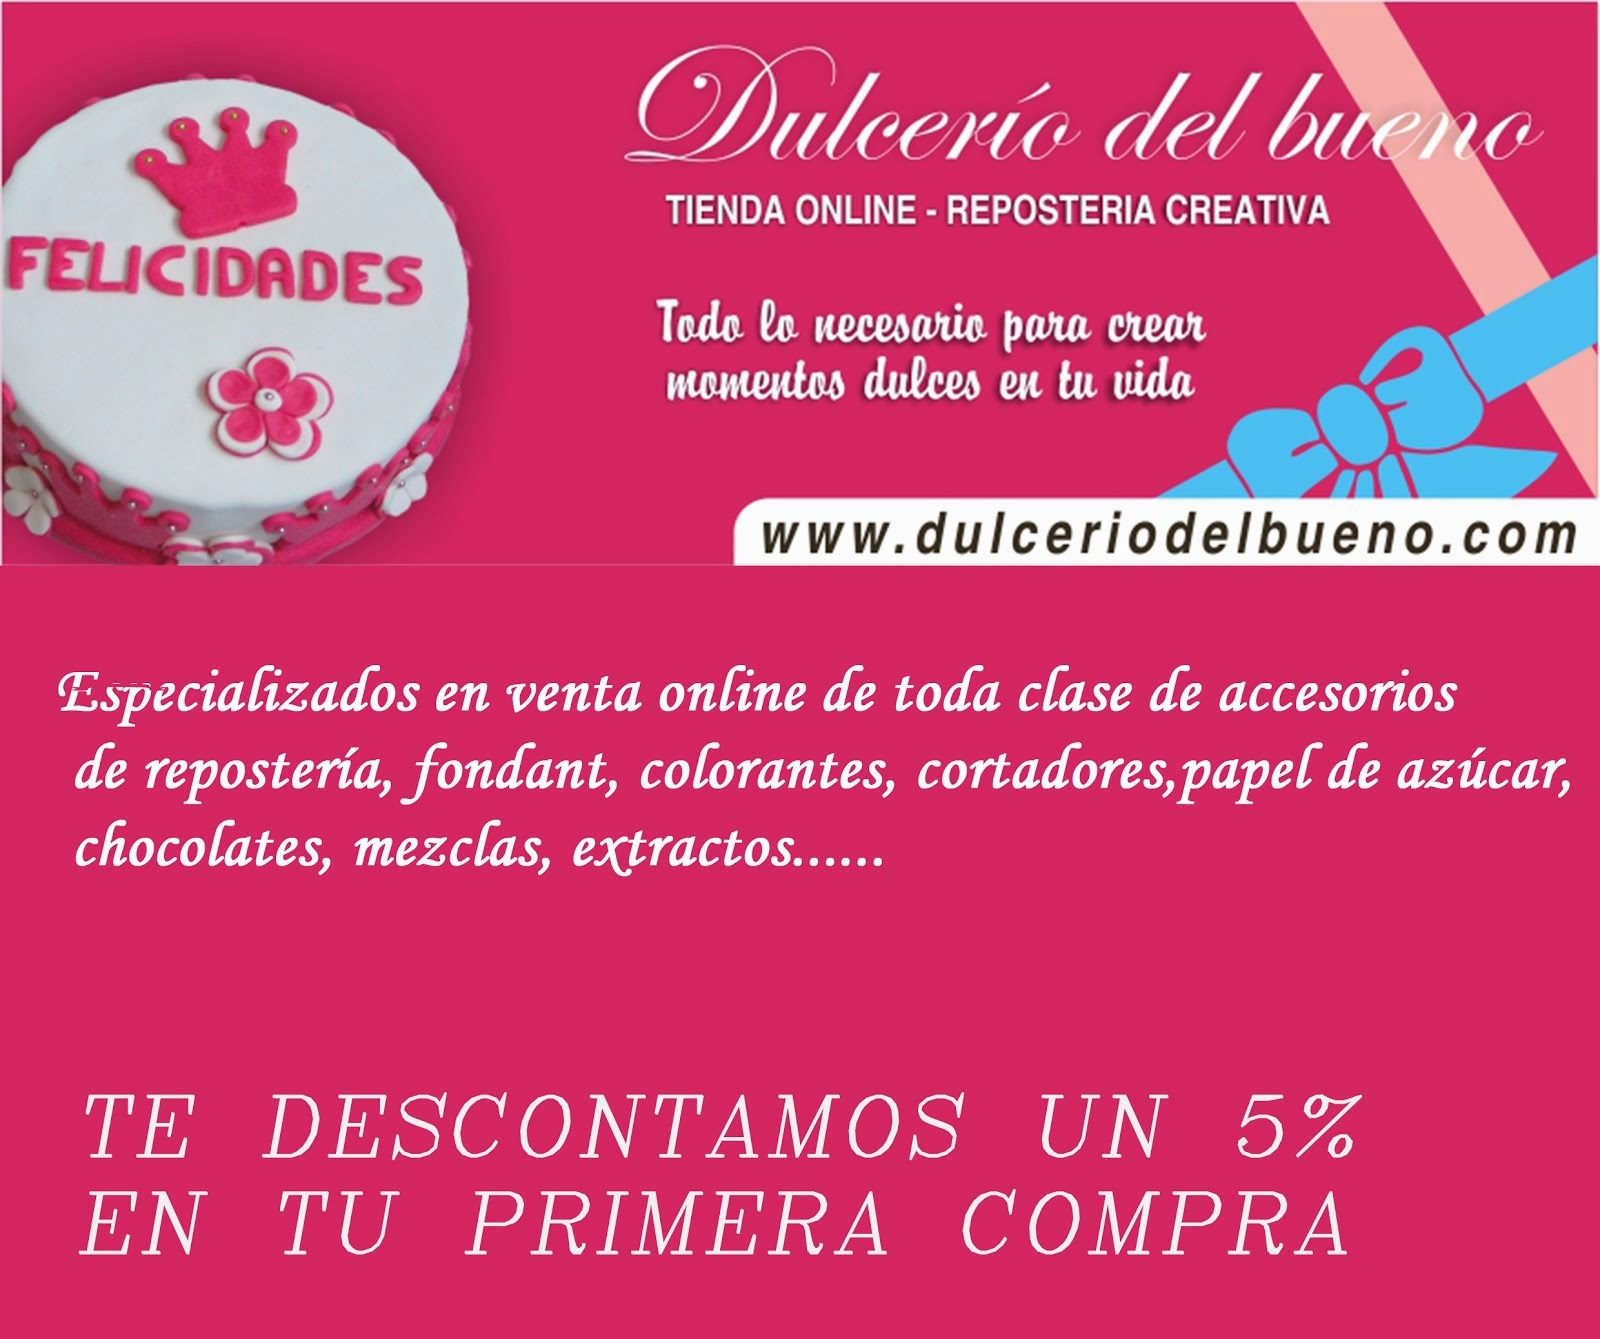 Tienda Online Dulcerio del Bueno